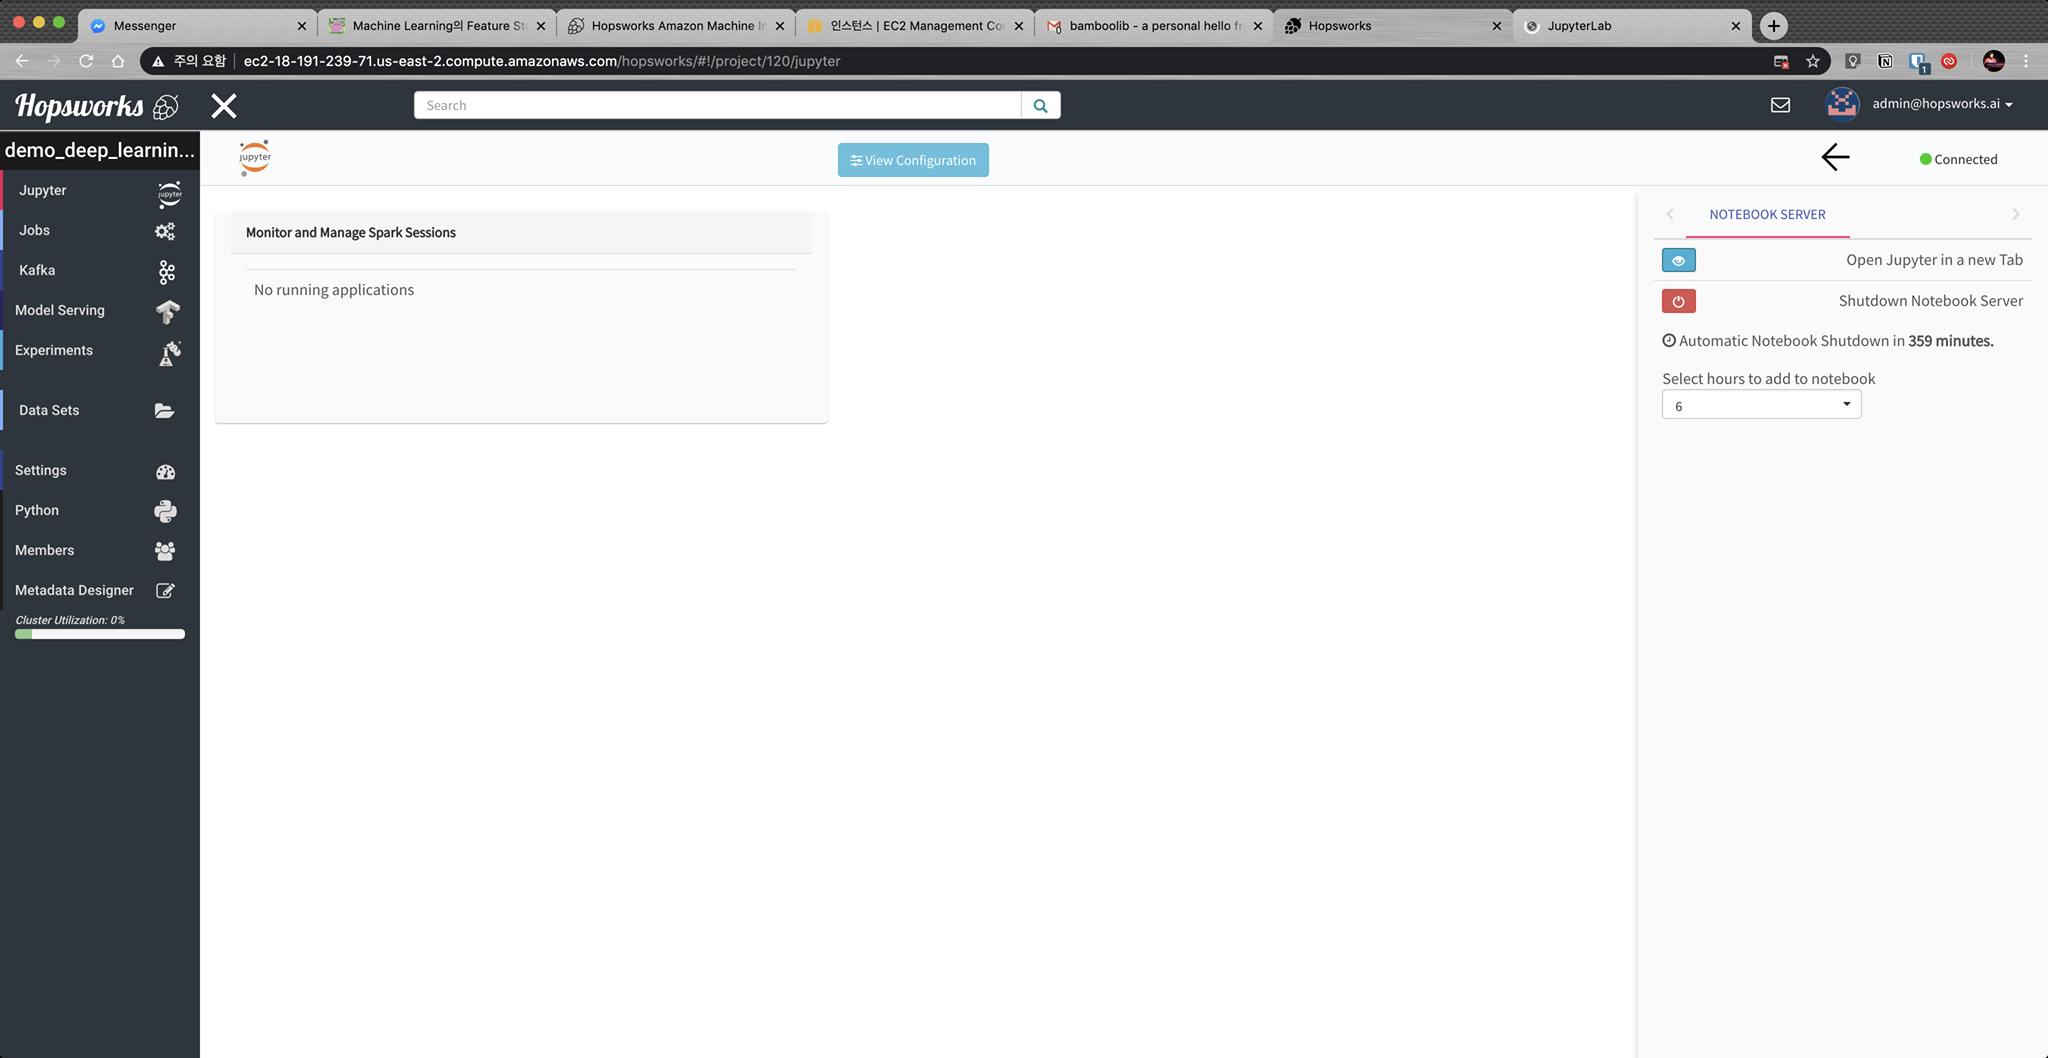 Sample Project에 들어온 모습. JupyterLab을 이용할 수 있다.